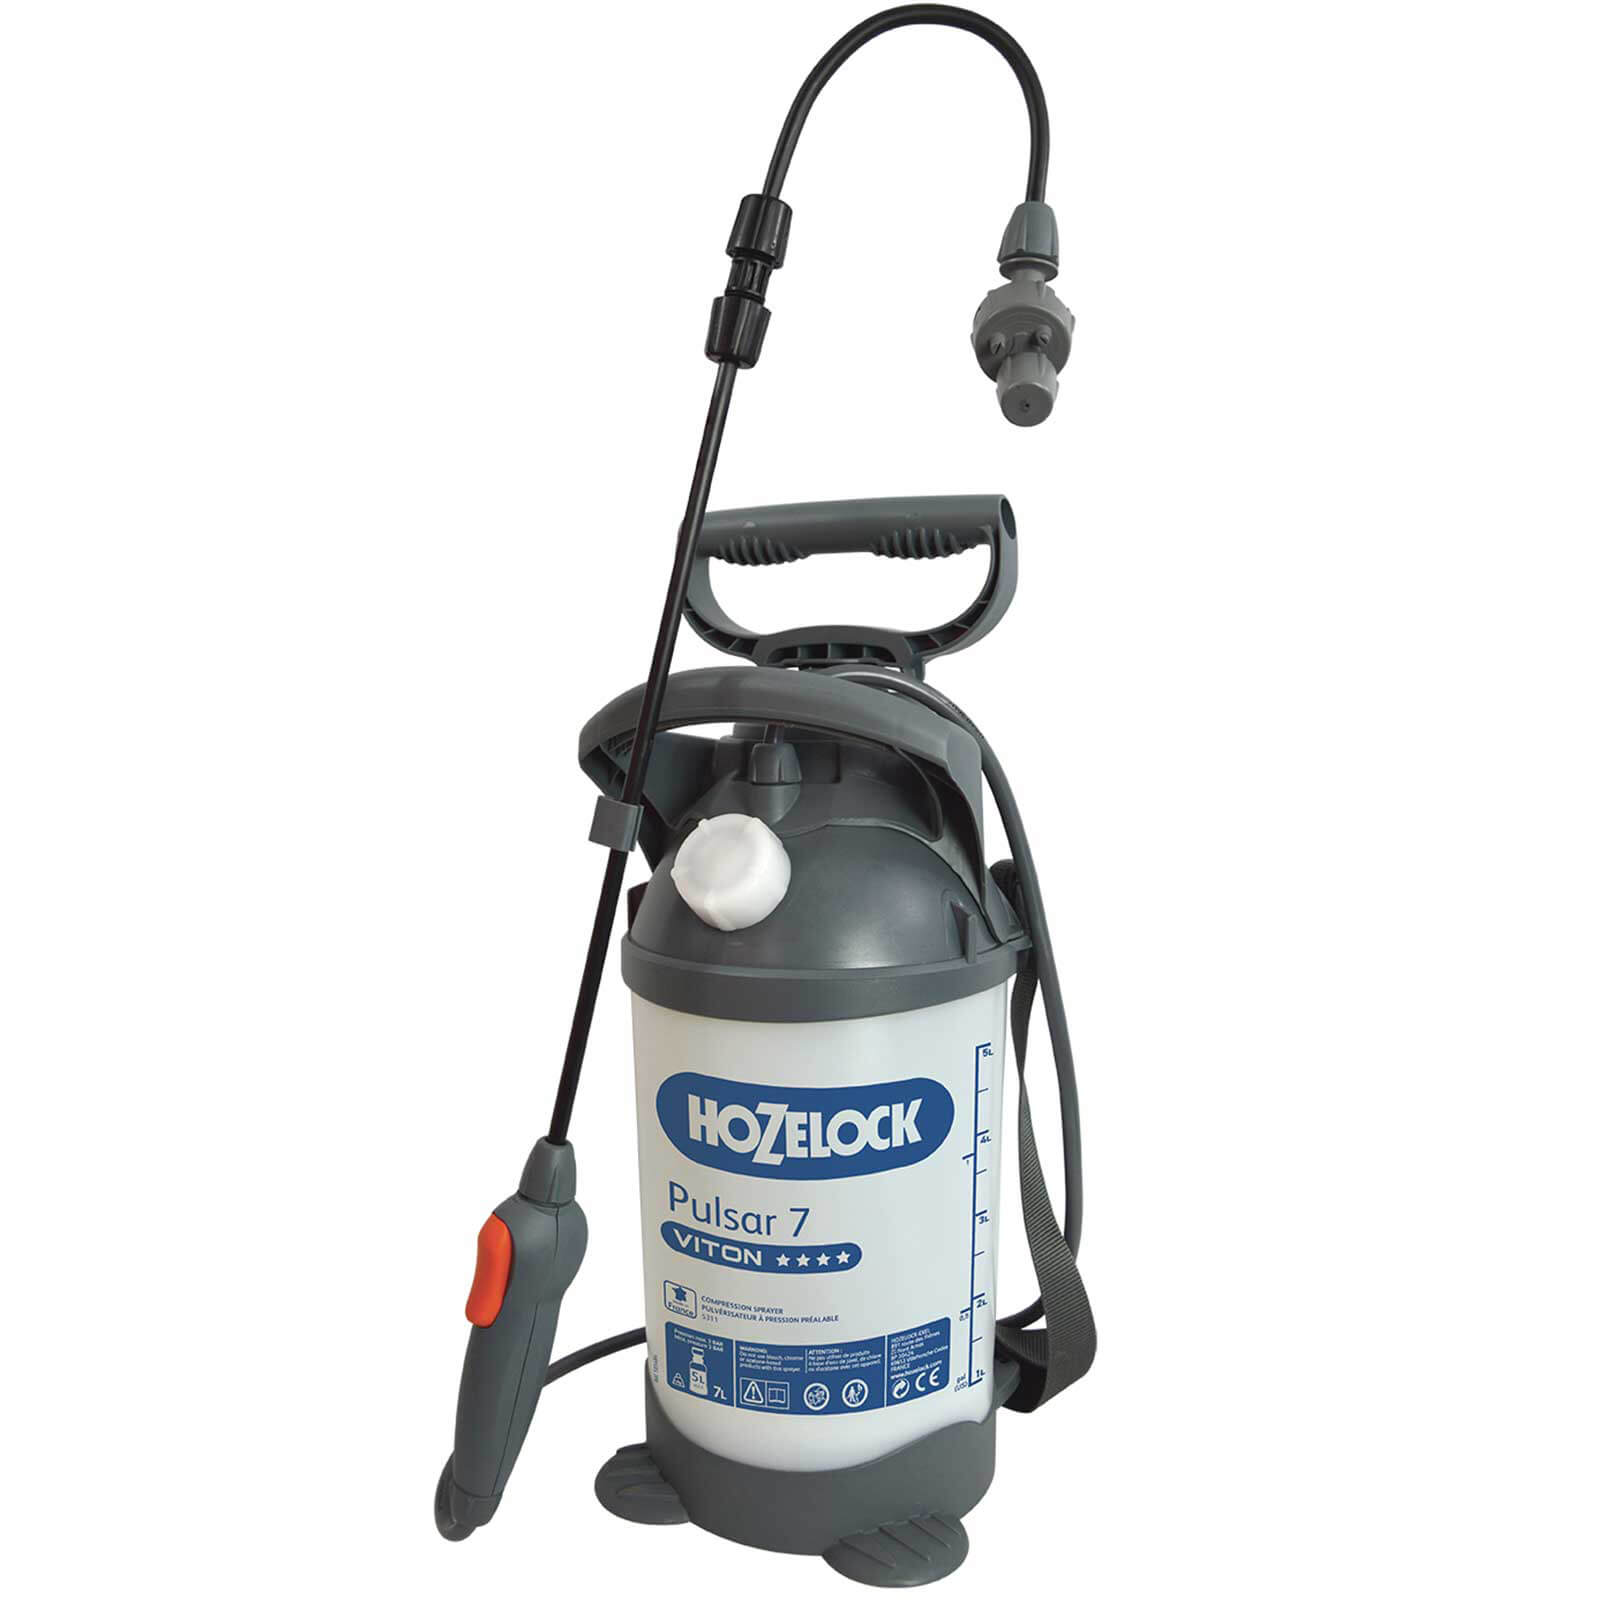 Hozelock PULSAR VITON Chemical Liquid Pressure Sprayer 7l